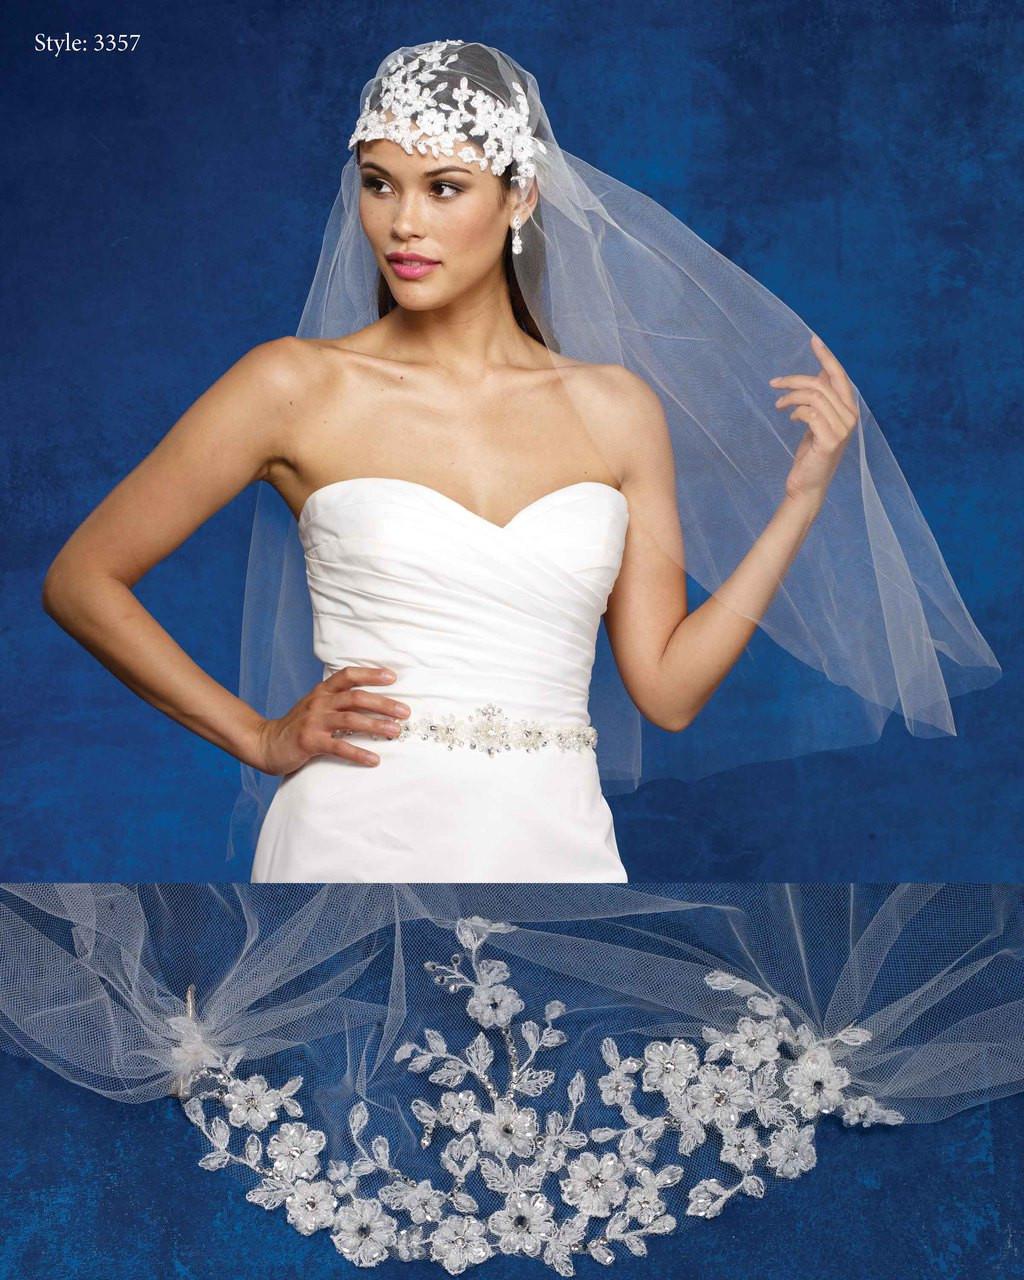 Marionat Bridal Veils 3357- The Bridal Veil Company - Veil with Clips and Lace Headband